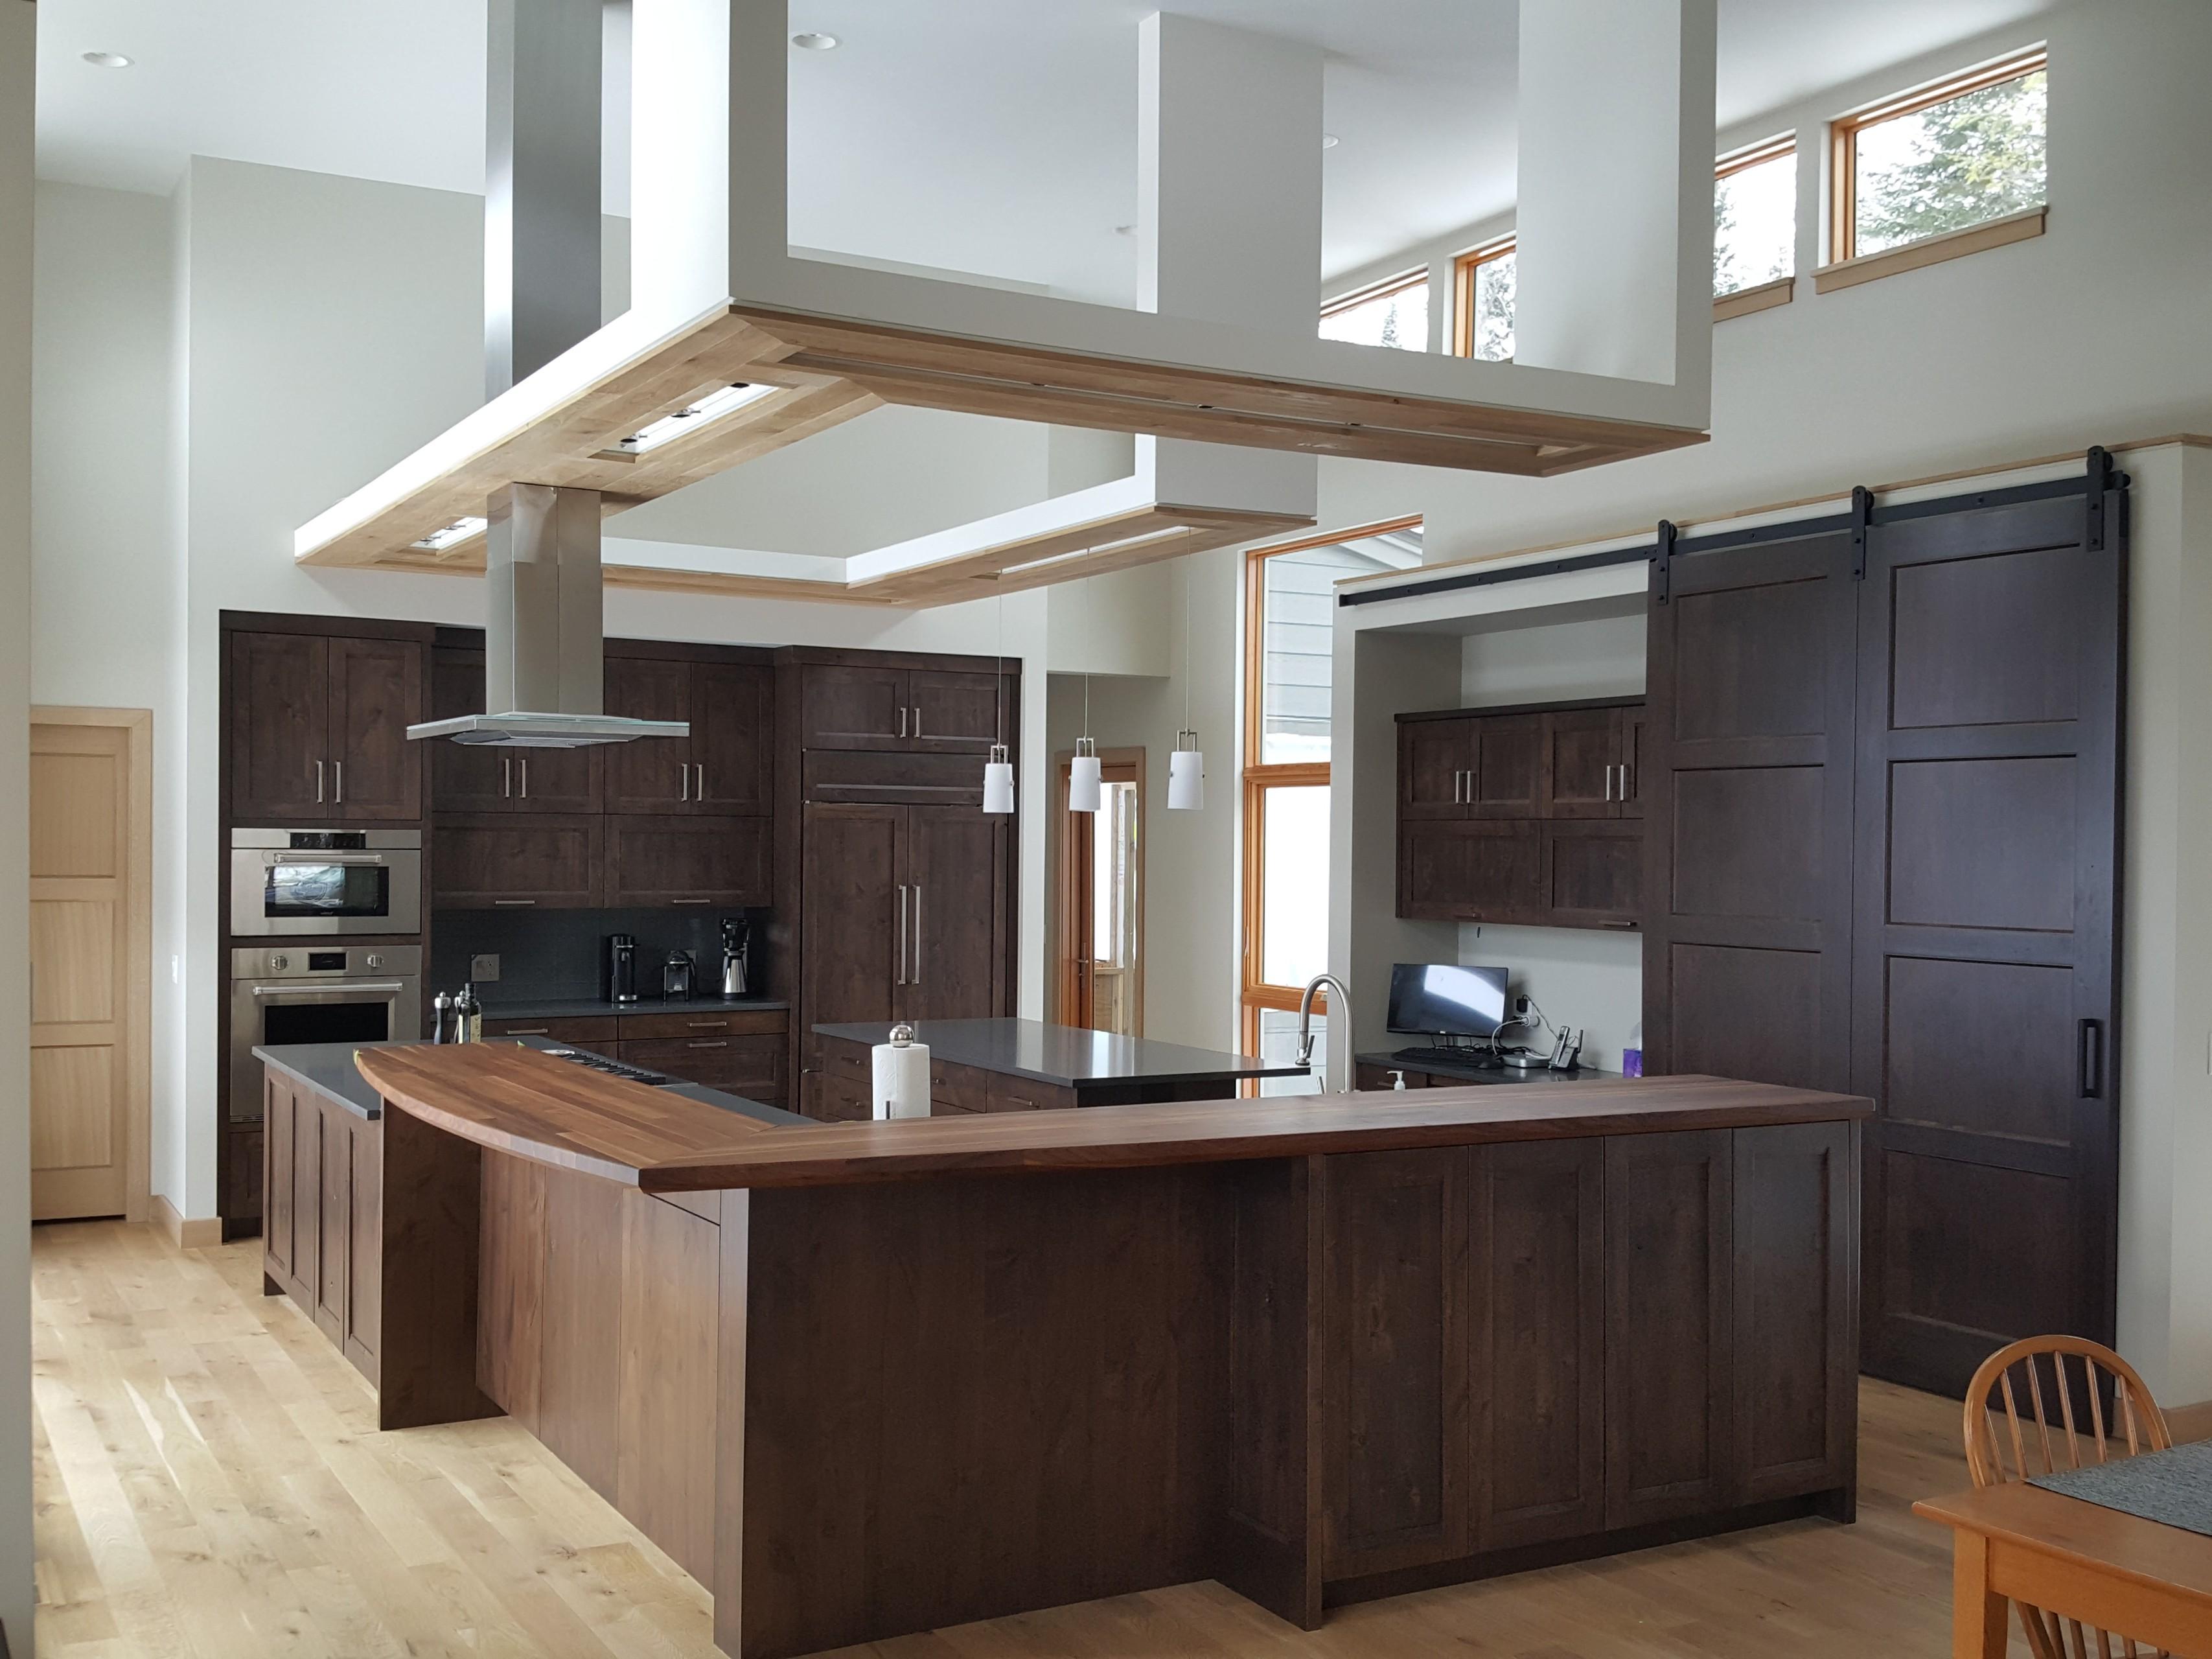 Bayfield - kitchen and lighting design